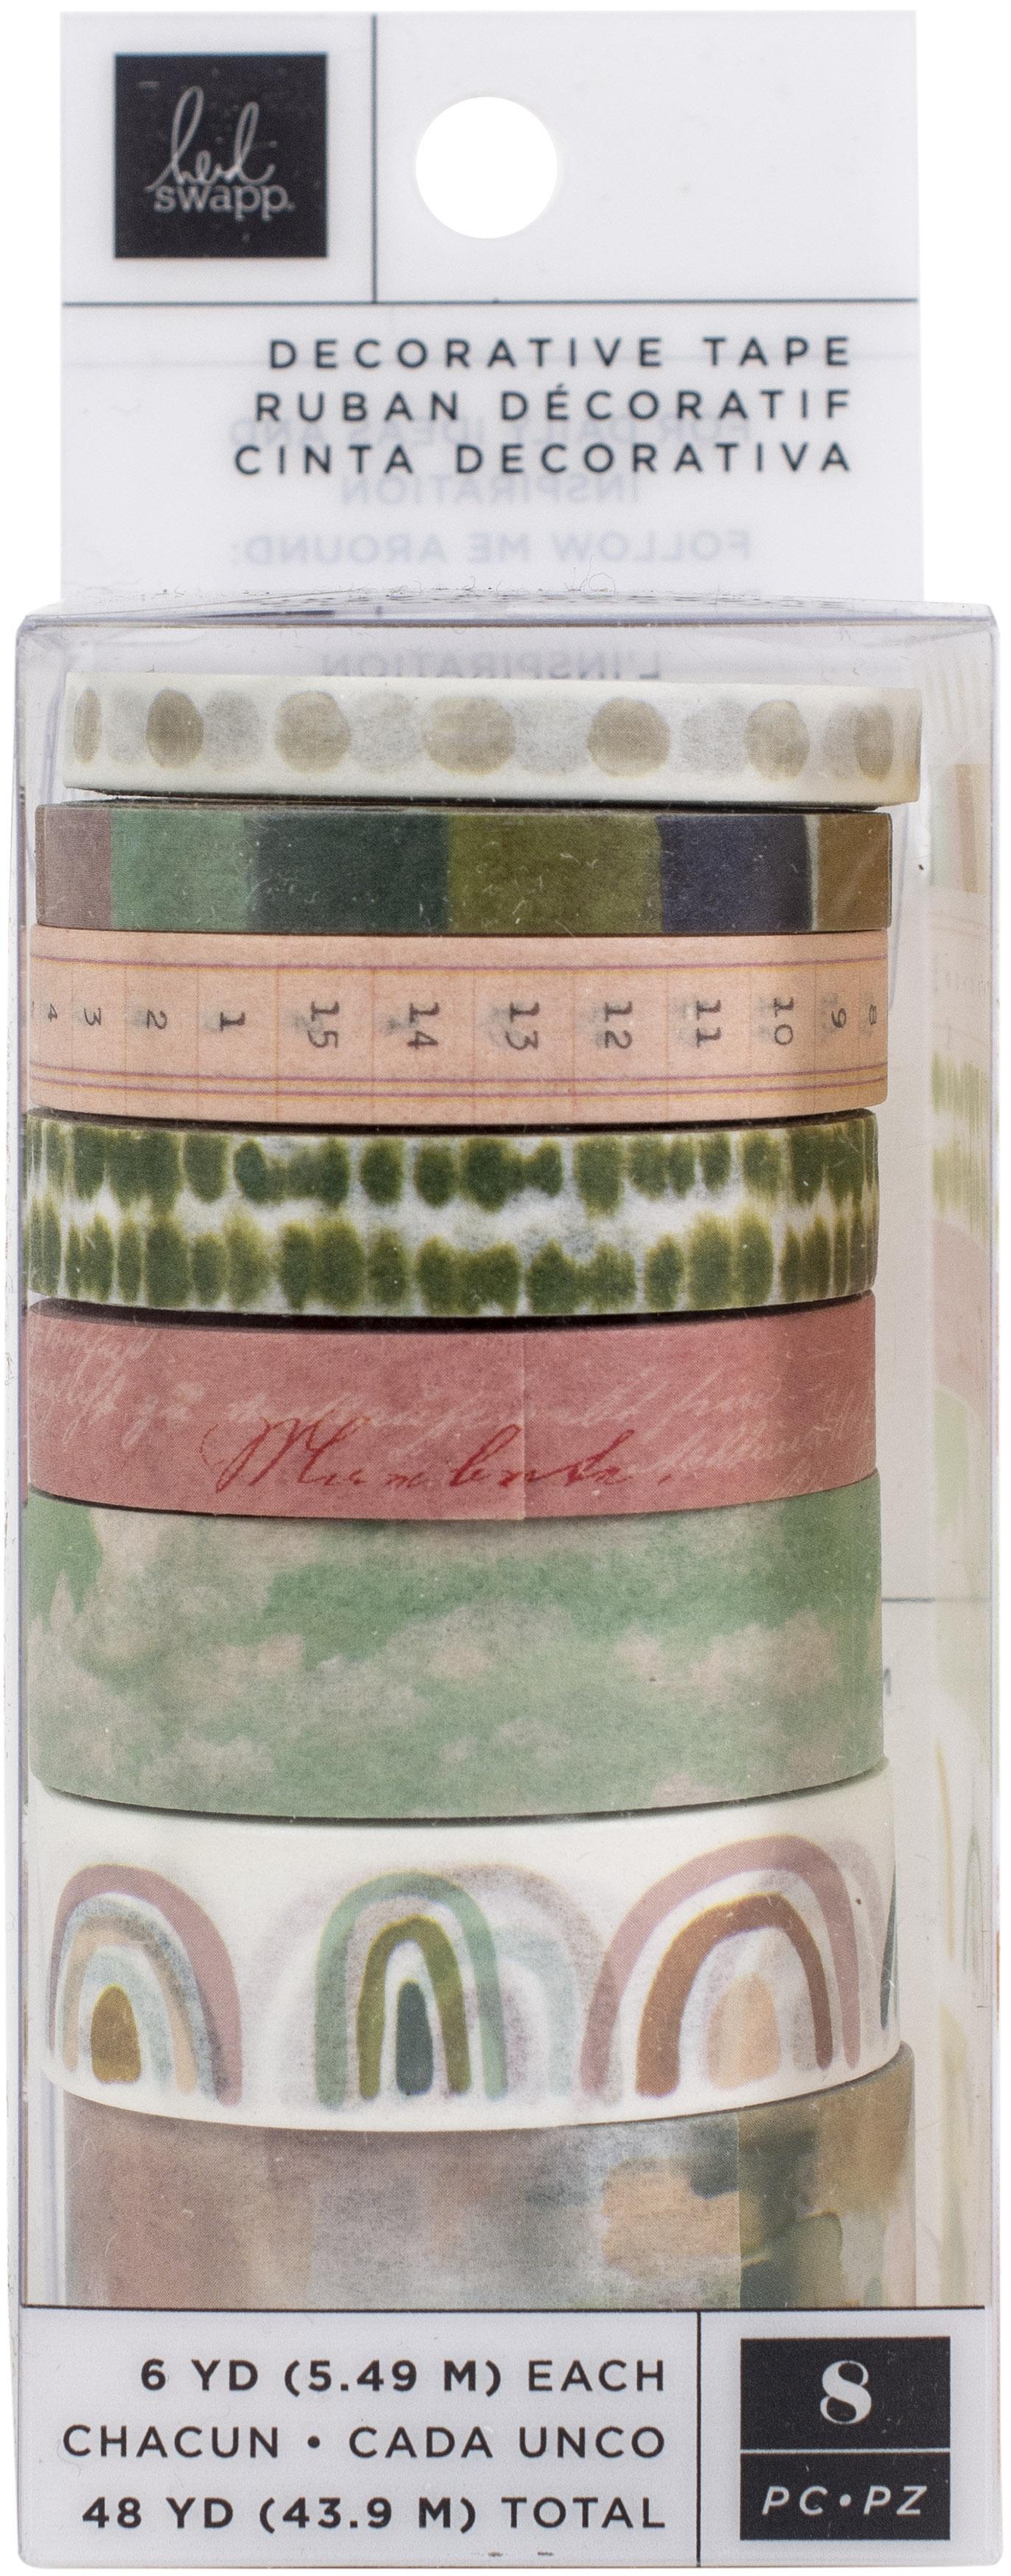 Heidi Swapp Care Free Washi Tape Rolls 8/Pkg-6 Yards Each